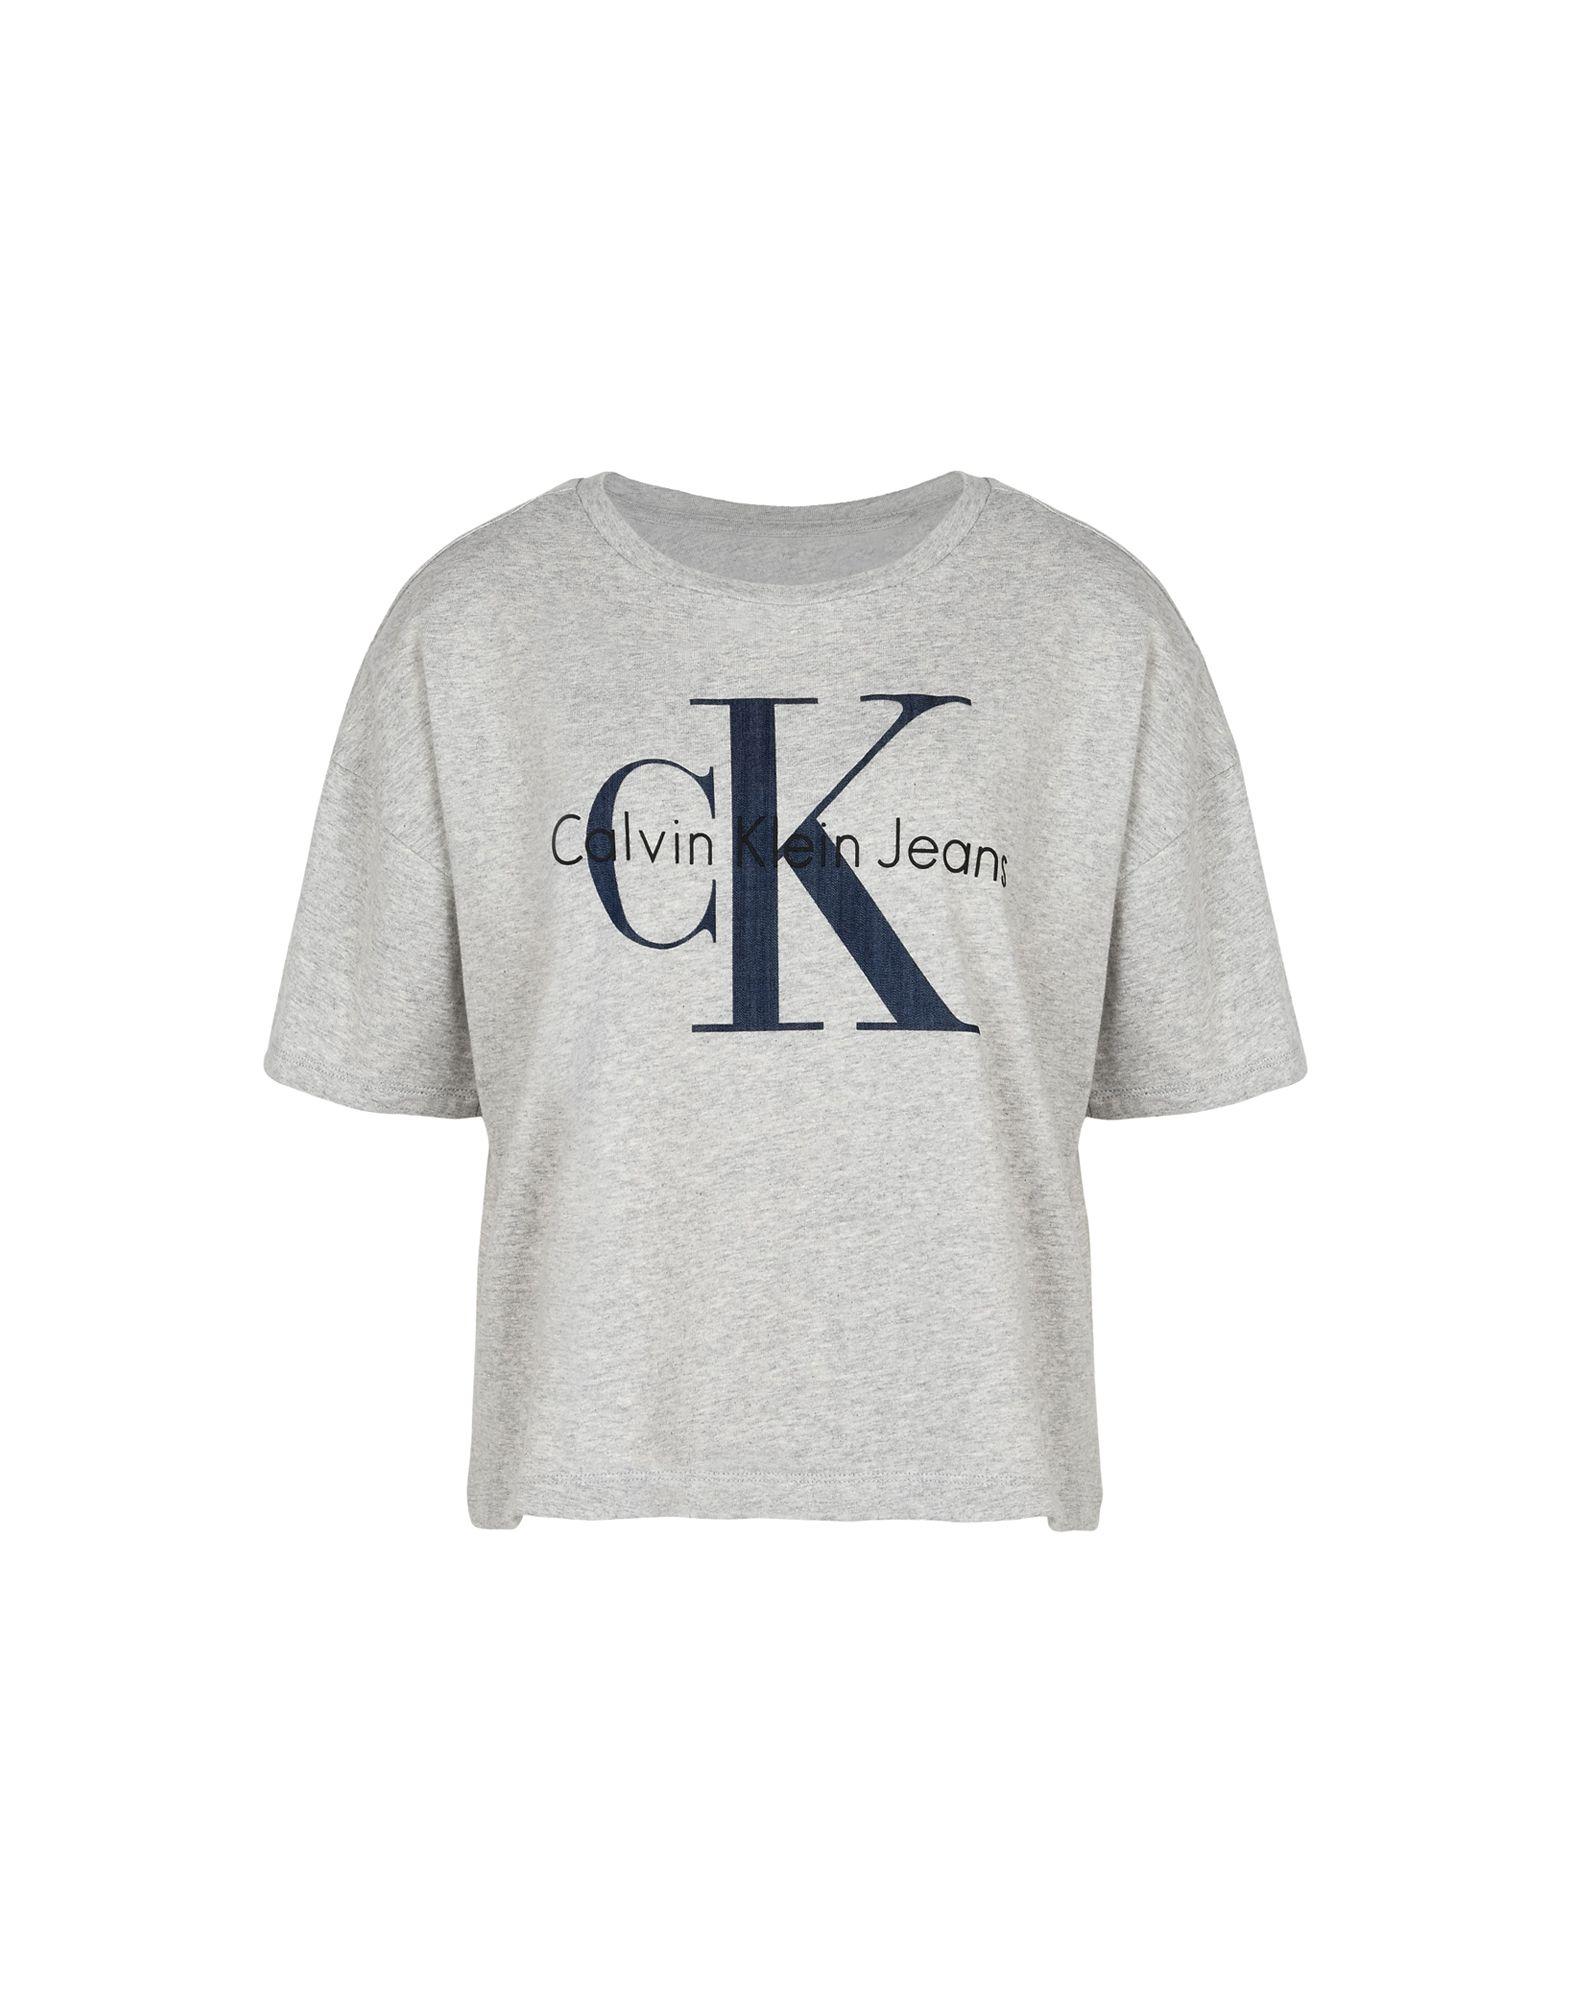 promo code cb6c7 1f486 Calvin Klein Jeans T-Shirt - Women Calvin Klein Jeans T ...